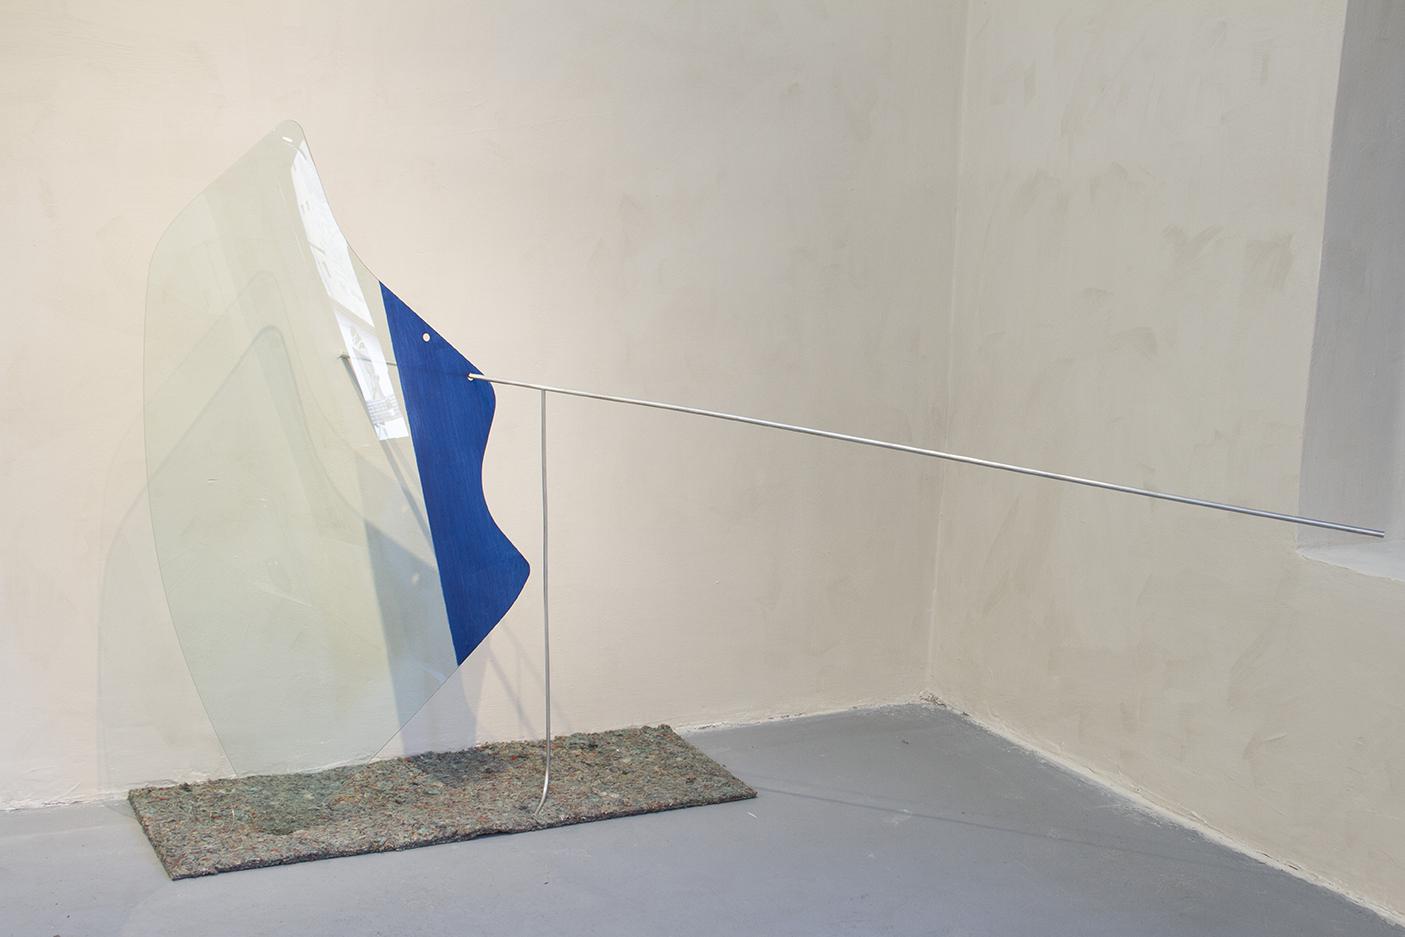 Slip on wall, glass, paint, felt, aluminium.